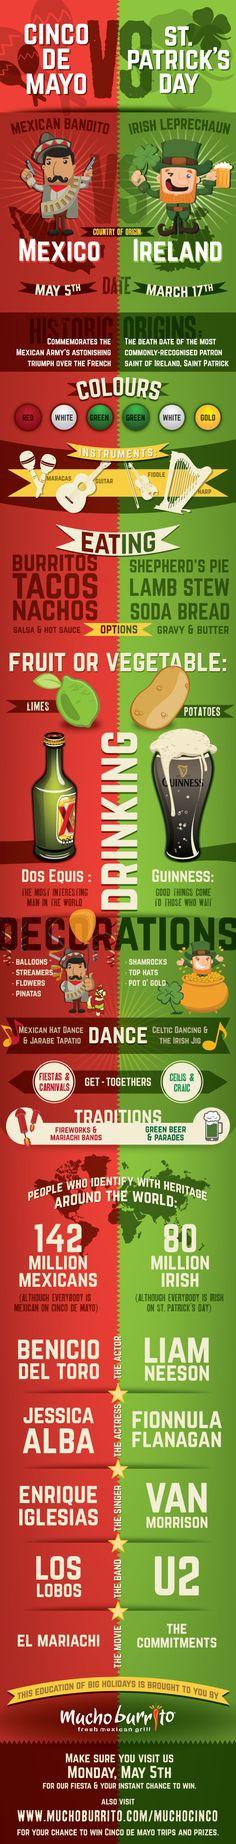 Cinco de Mayo VS St. Patrick's Day [infographic]